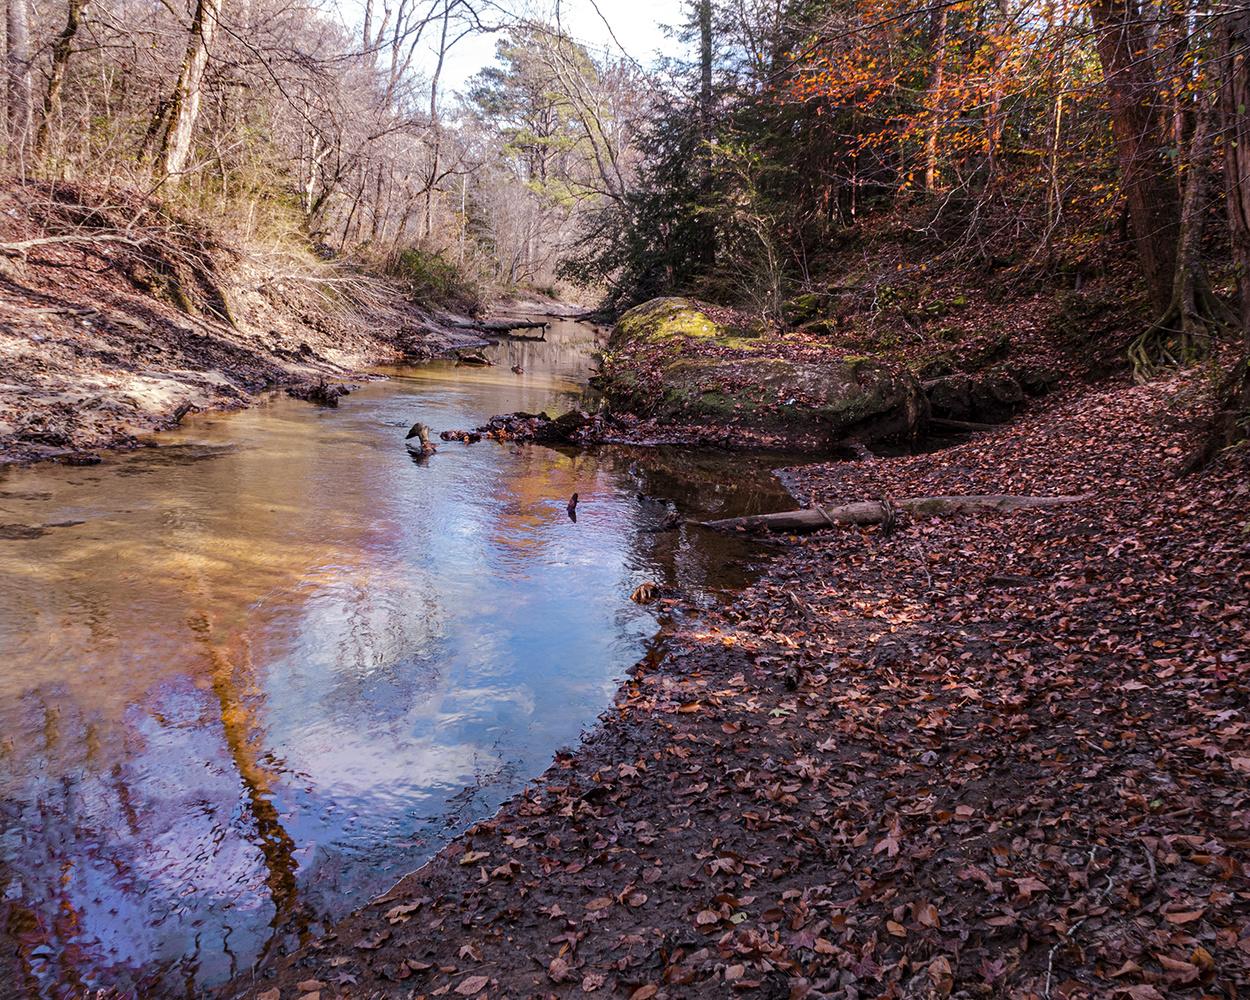 Late fall Sipsy Wilderness by John Pless